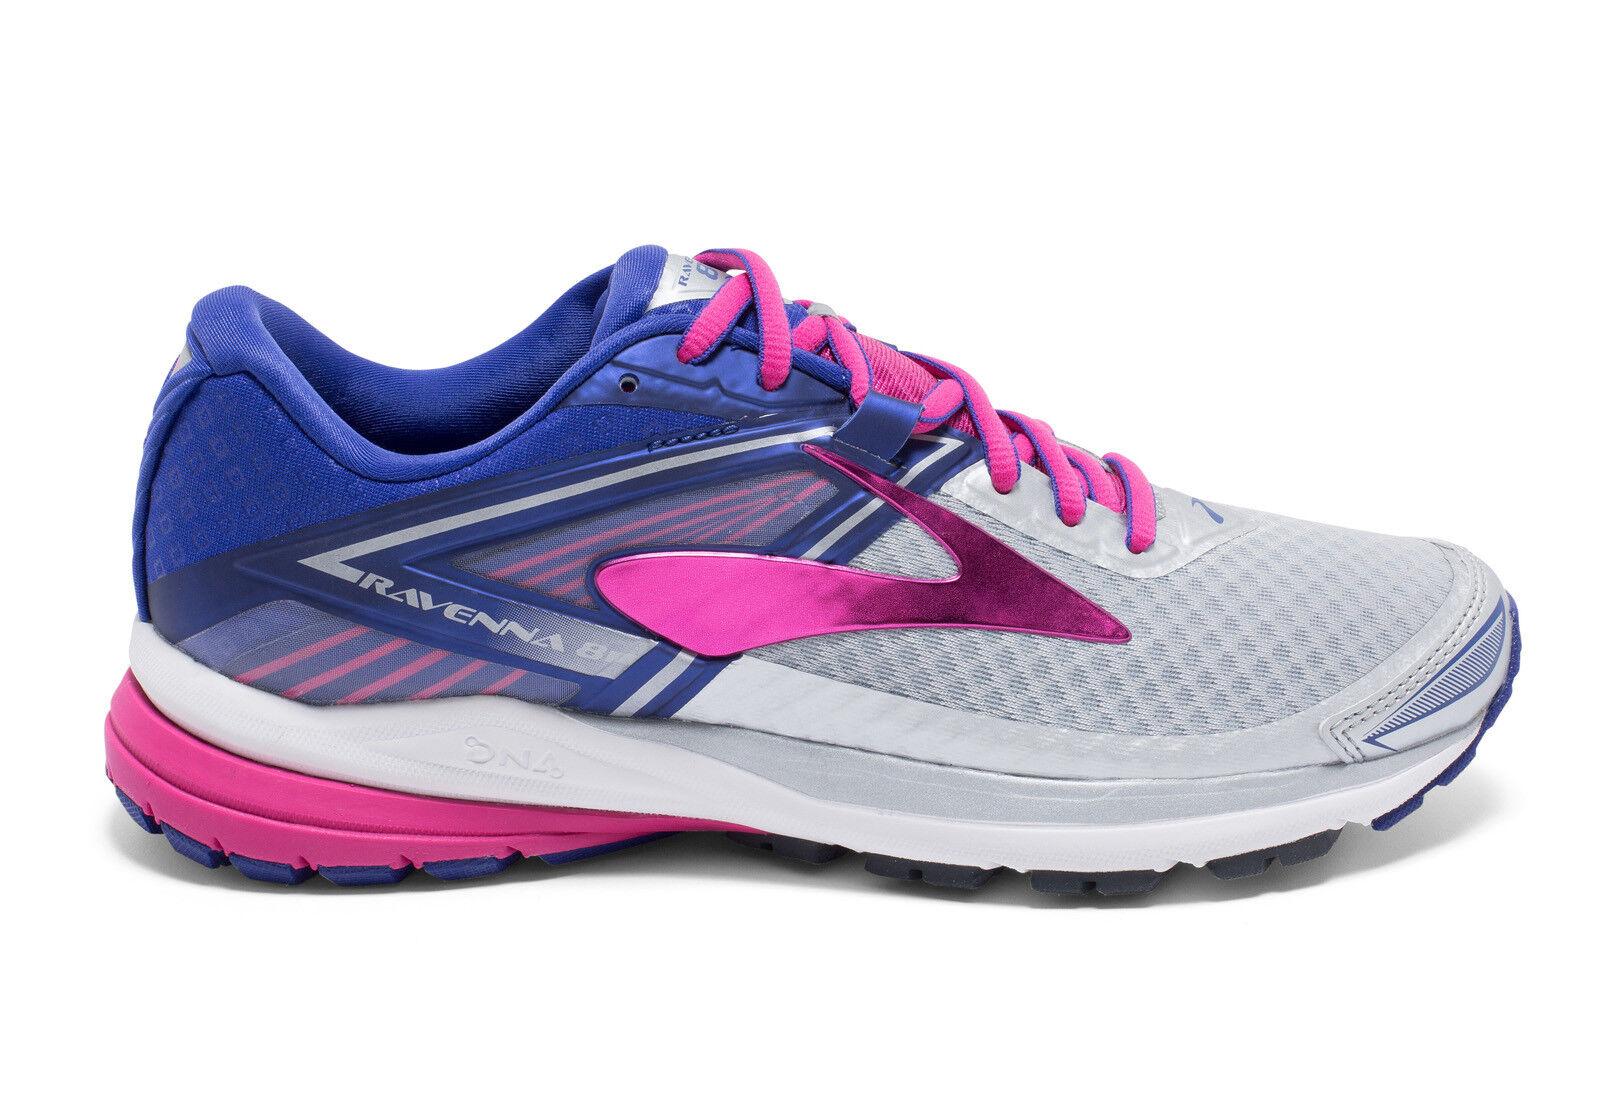 SPECIAL Brooks Ravenna 8 donna  Running scarpe (B) (089)  in vendita